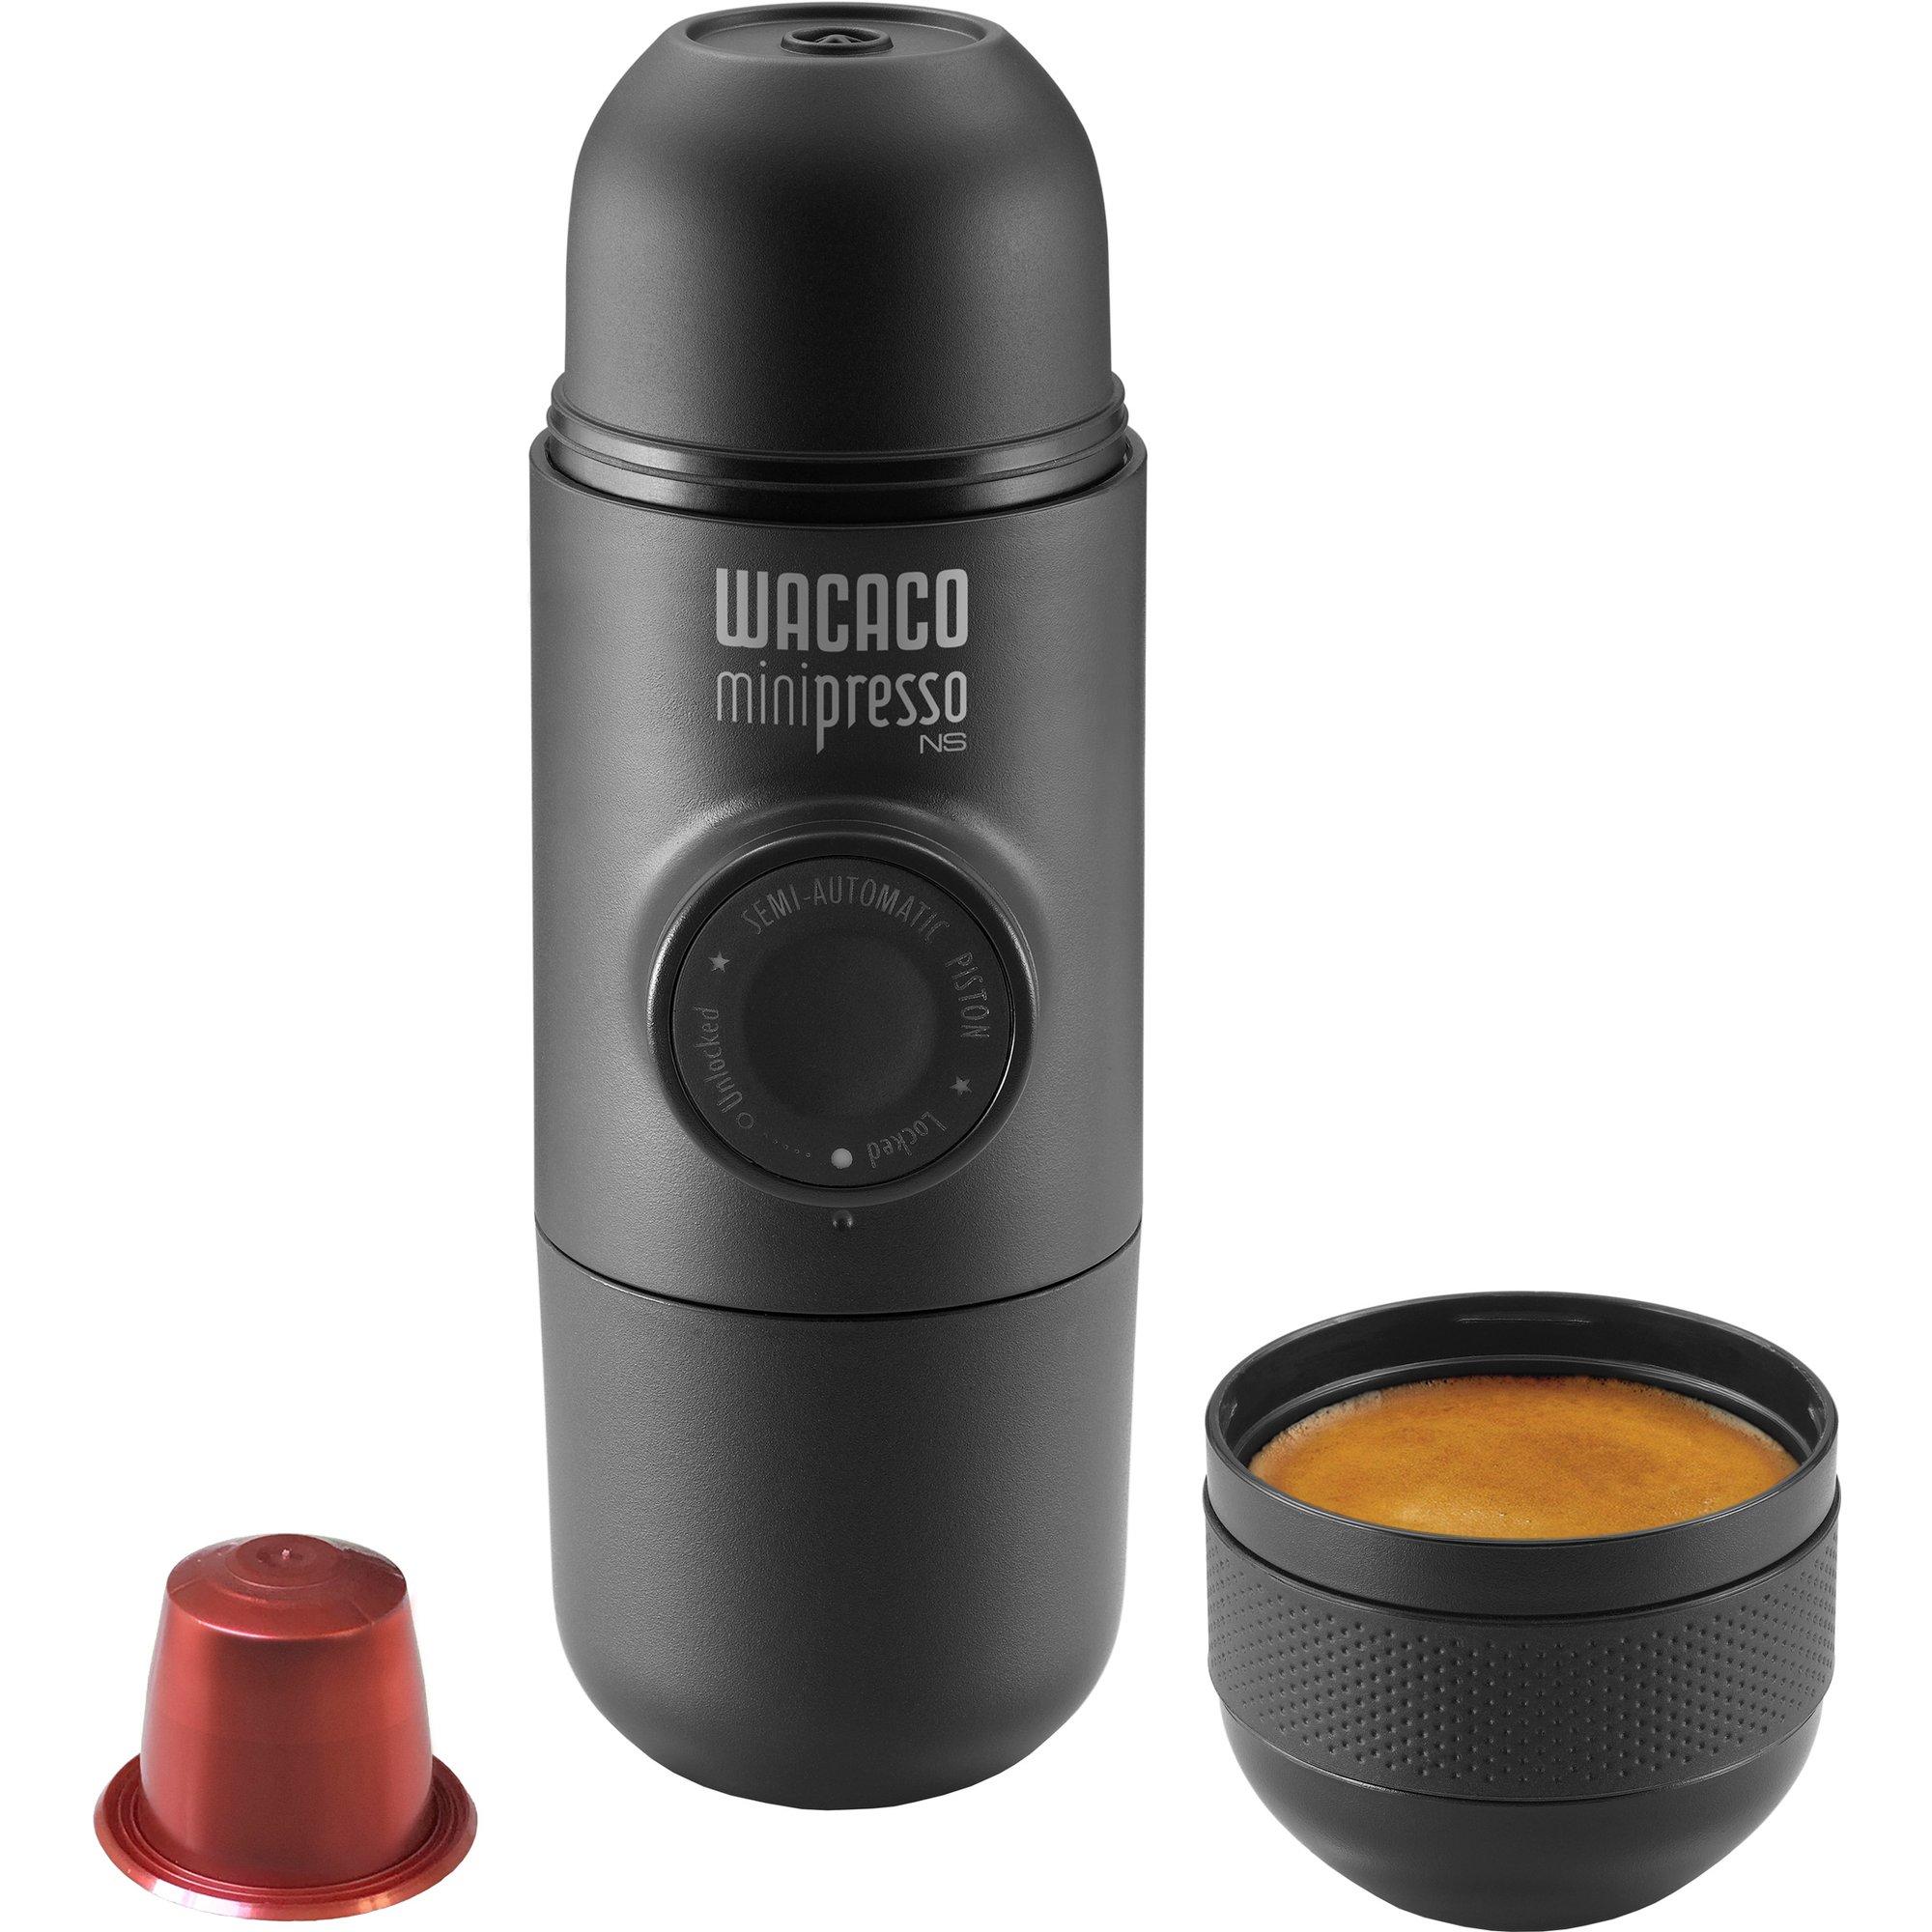 Wacaco Minipresso NS espressobrygger – Smart og innovativ mini-espressobrygger til vandreturen